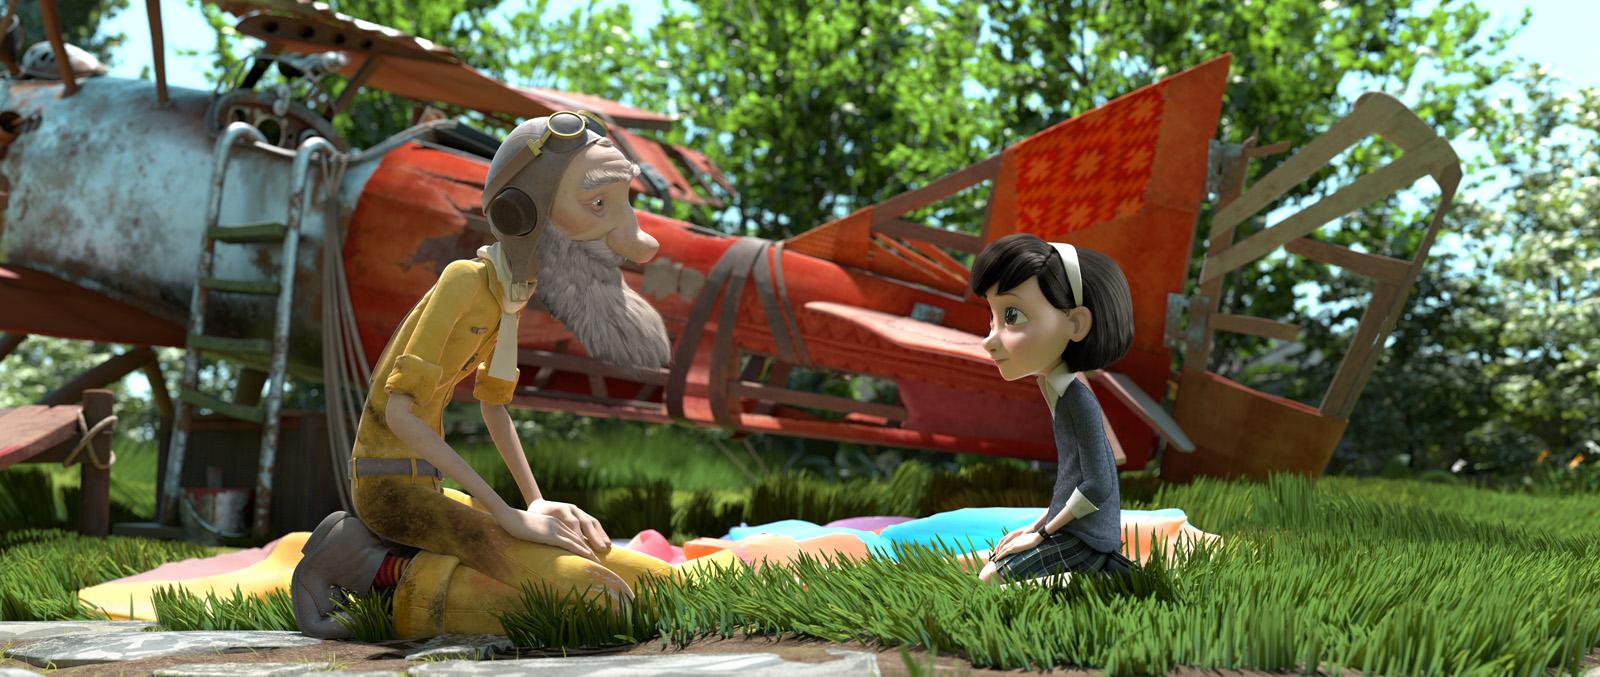 Filme O Pequeno Principe 2015 inside le petit prince : joli conte poétique   brain damaged